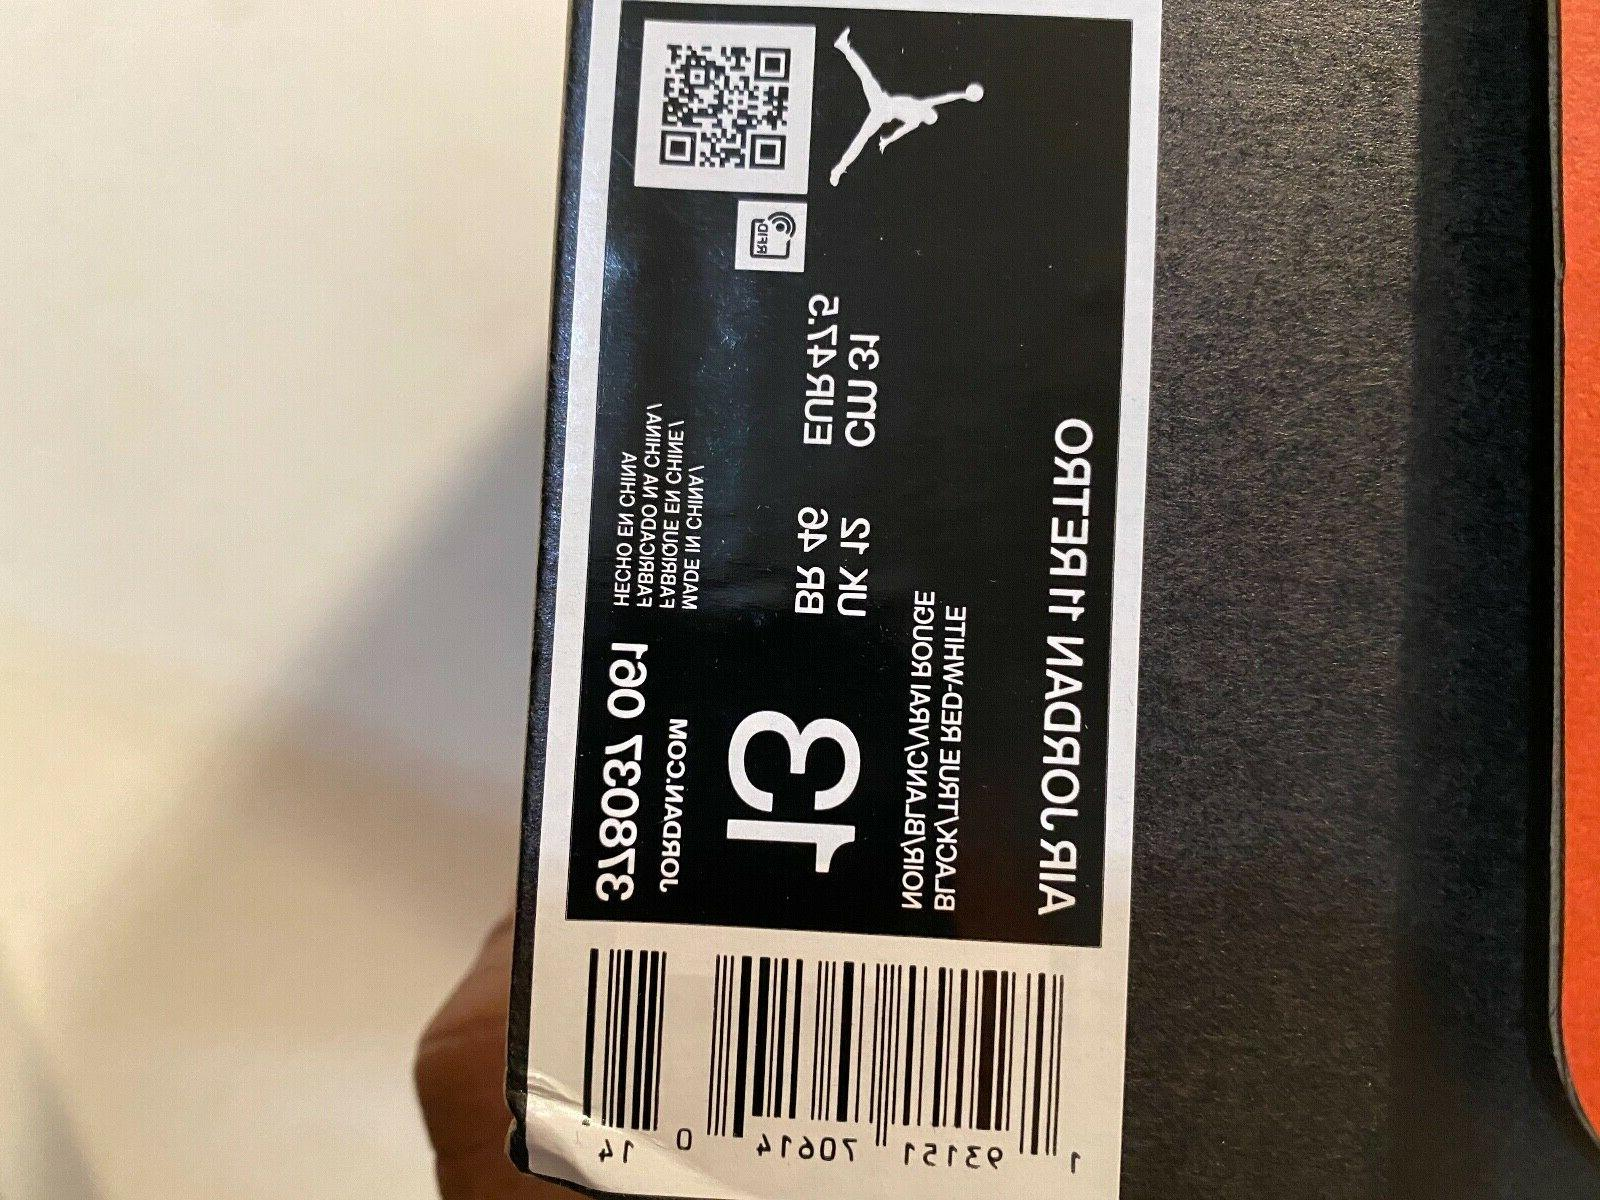 Mens Air Jordan 11 Retro 061 basketball shoes